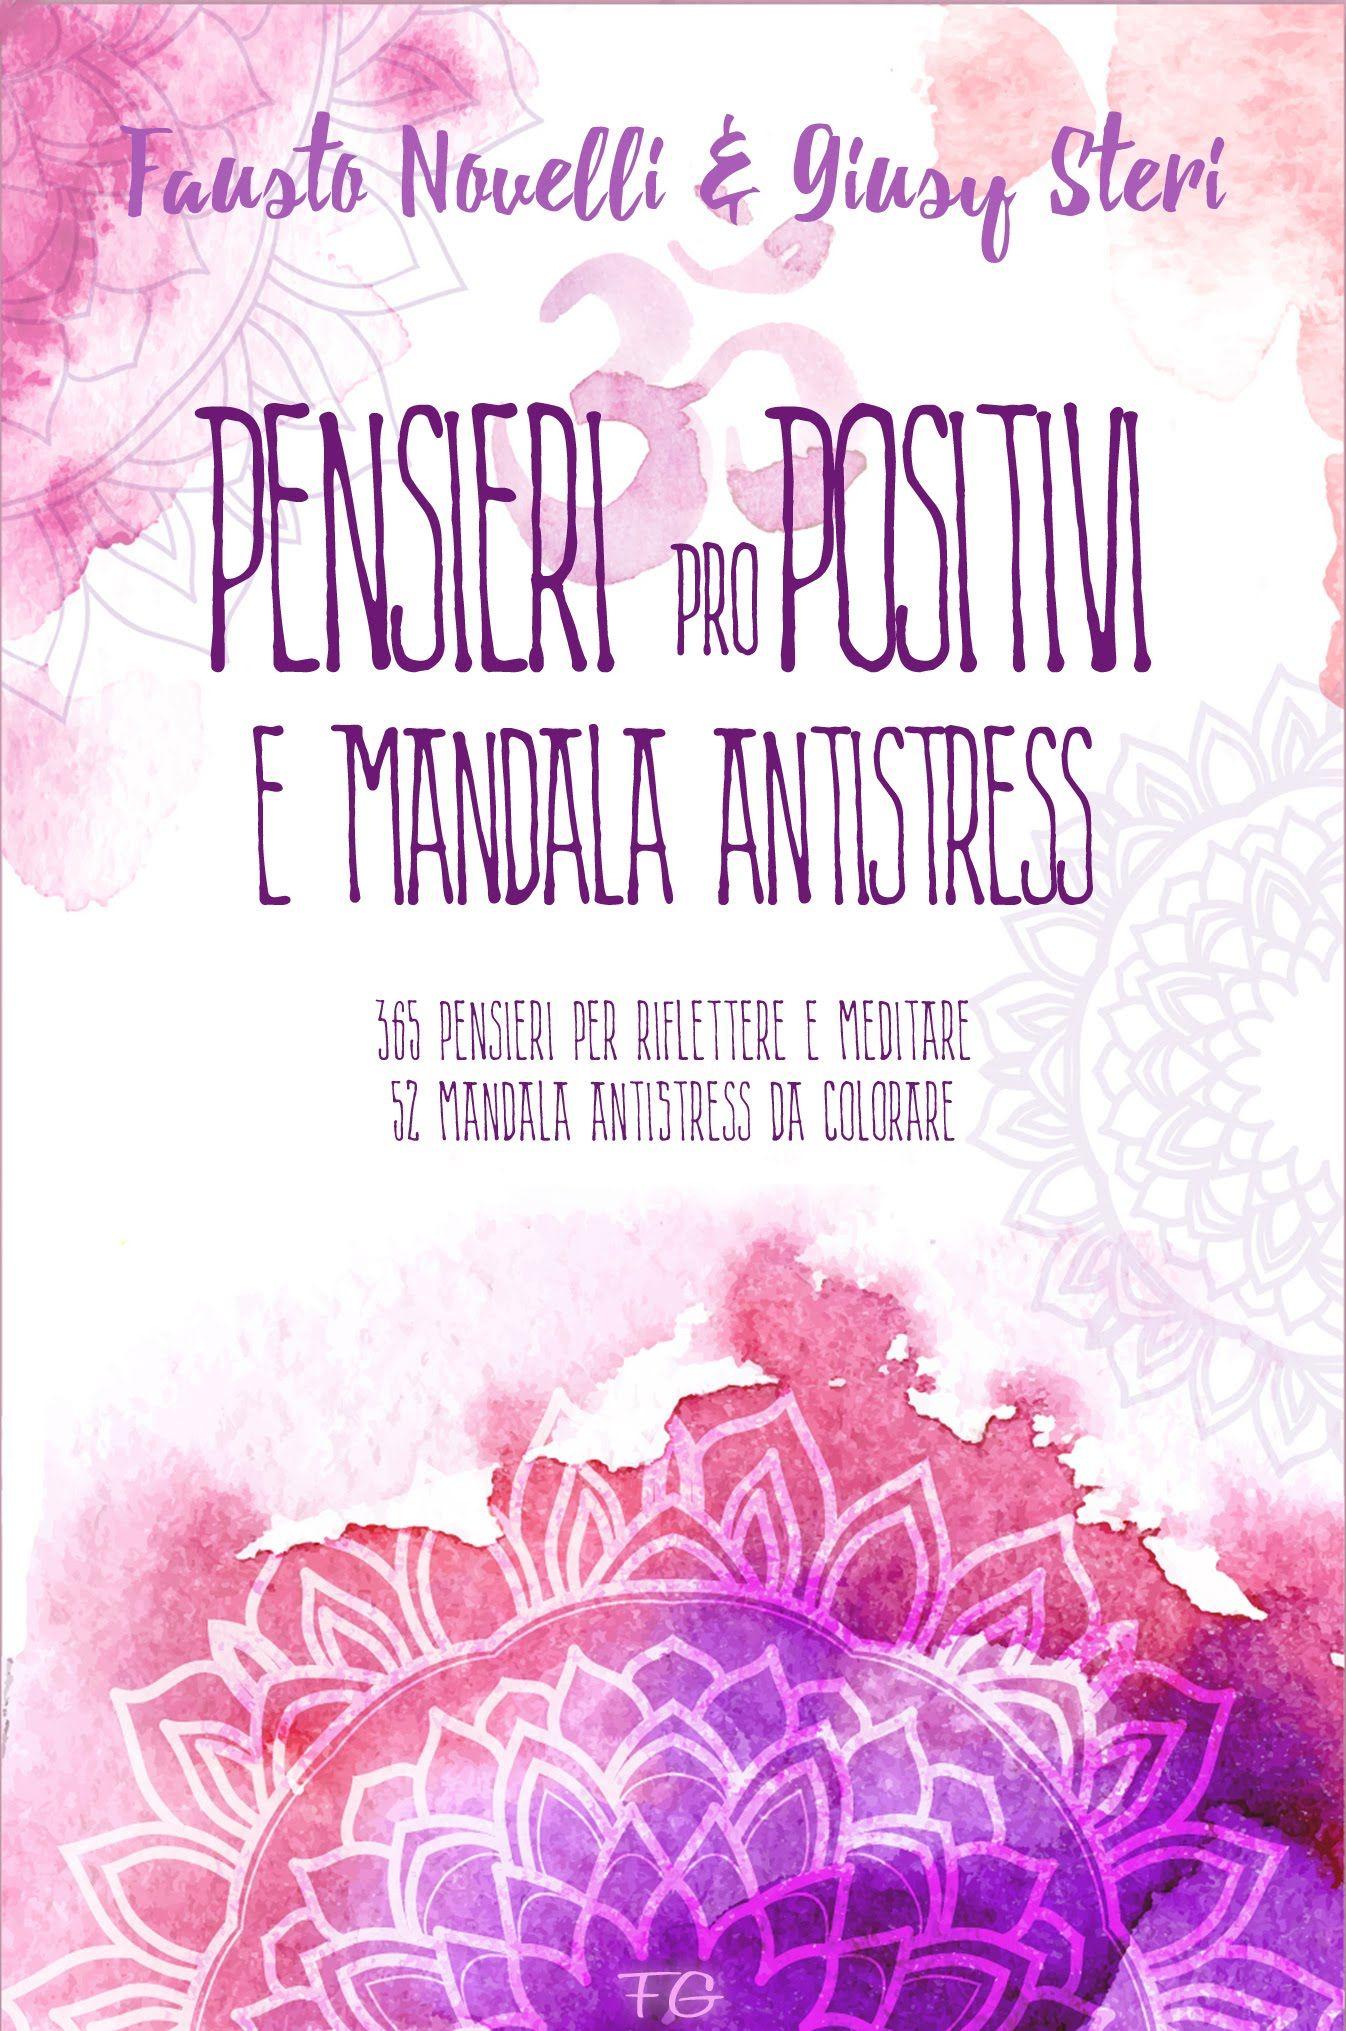 Pensieri proPositivi e Mandala Antistress